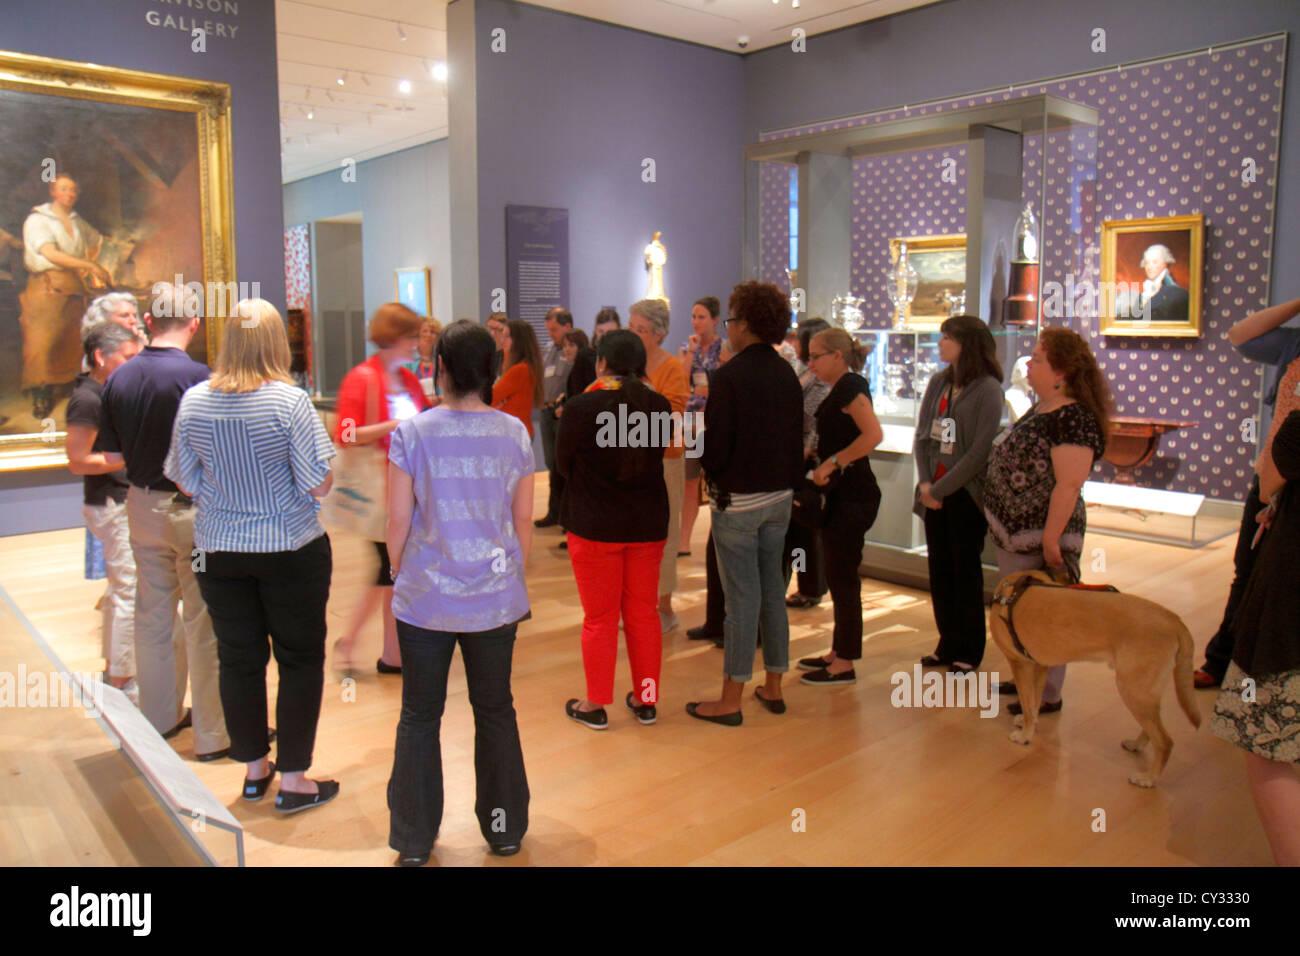 Boston Massachusetts Huntington Avenue Museum of Fine Arts collection paintings art - Stock Image